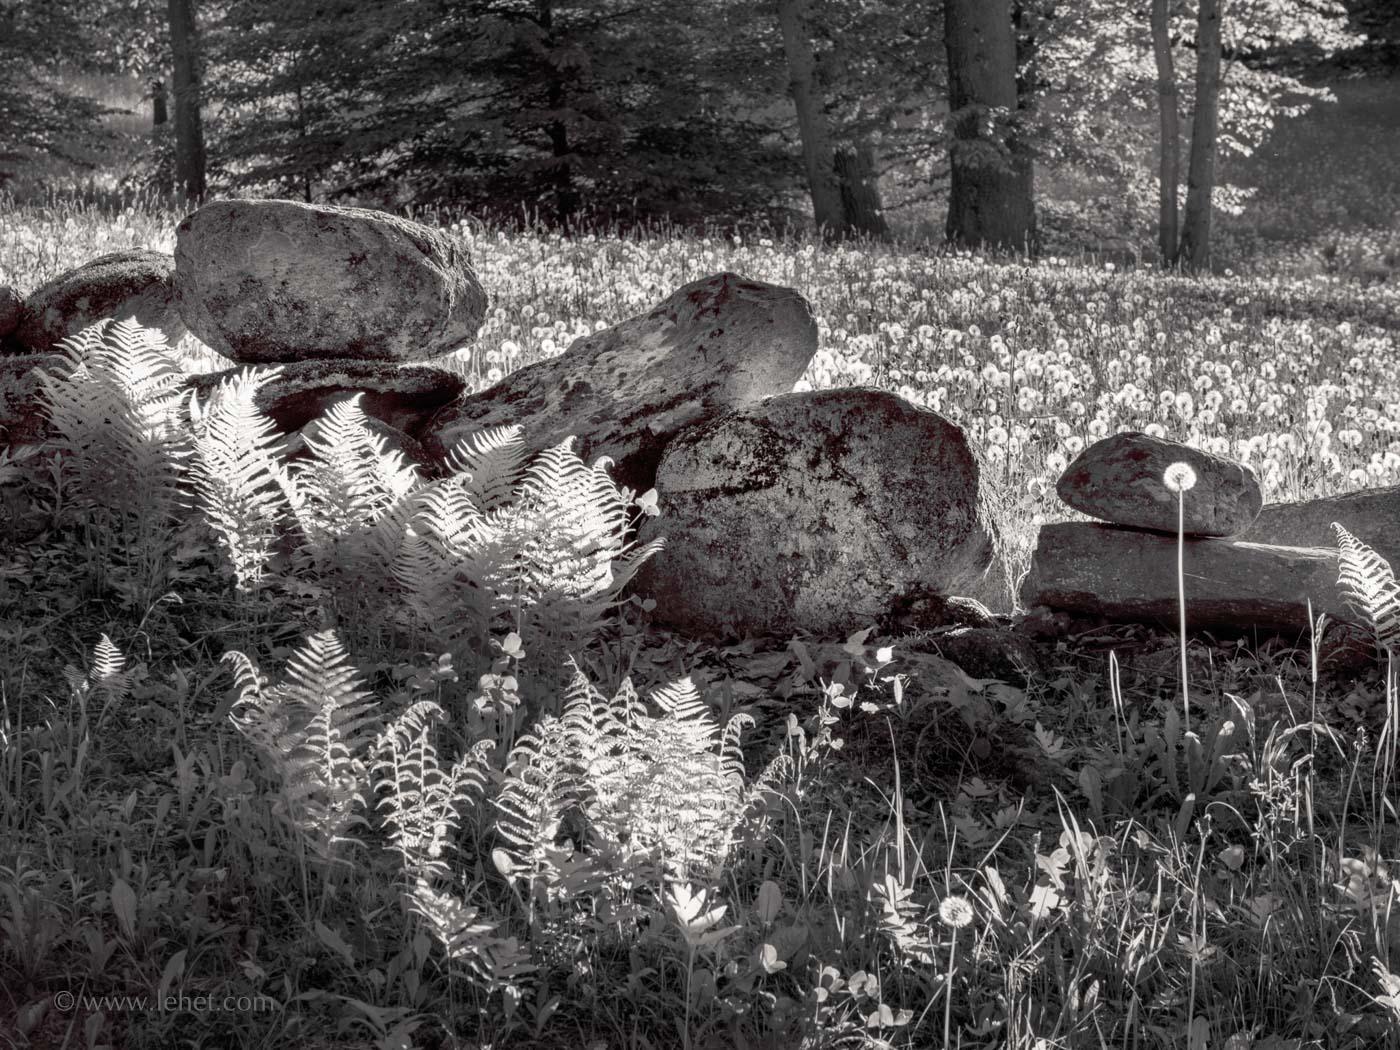 Stone Wall, Ferns, Dandelions,Vermont